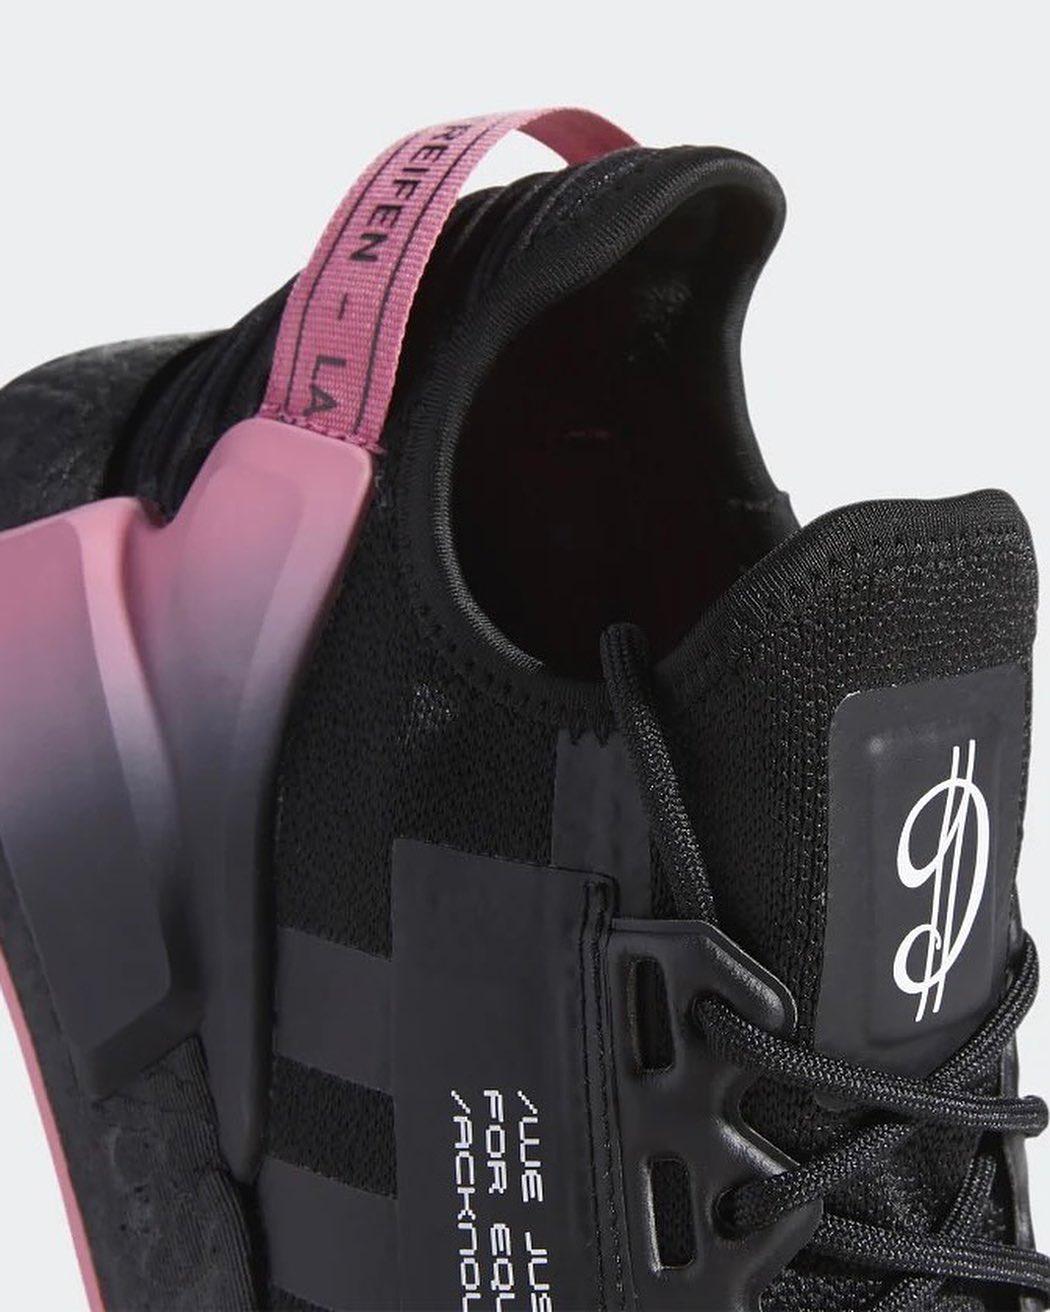 Dame,D.O.L.L.A,NMD,adidas  黑粉配色!全新 Dame NMD 图片曝光!